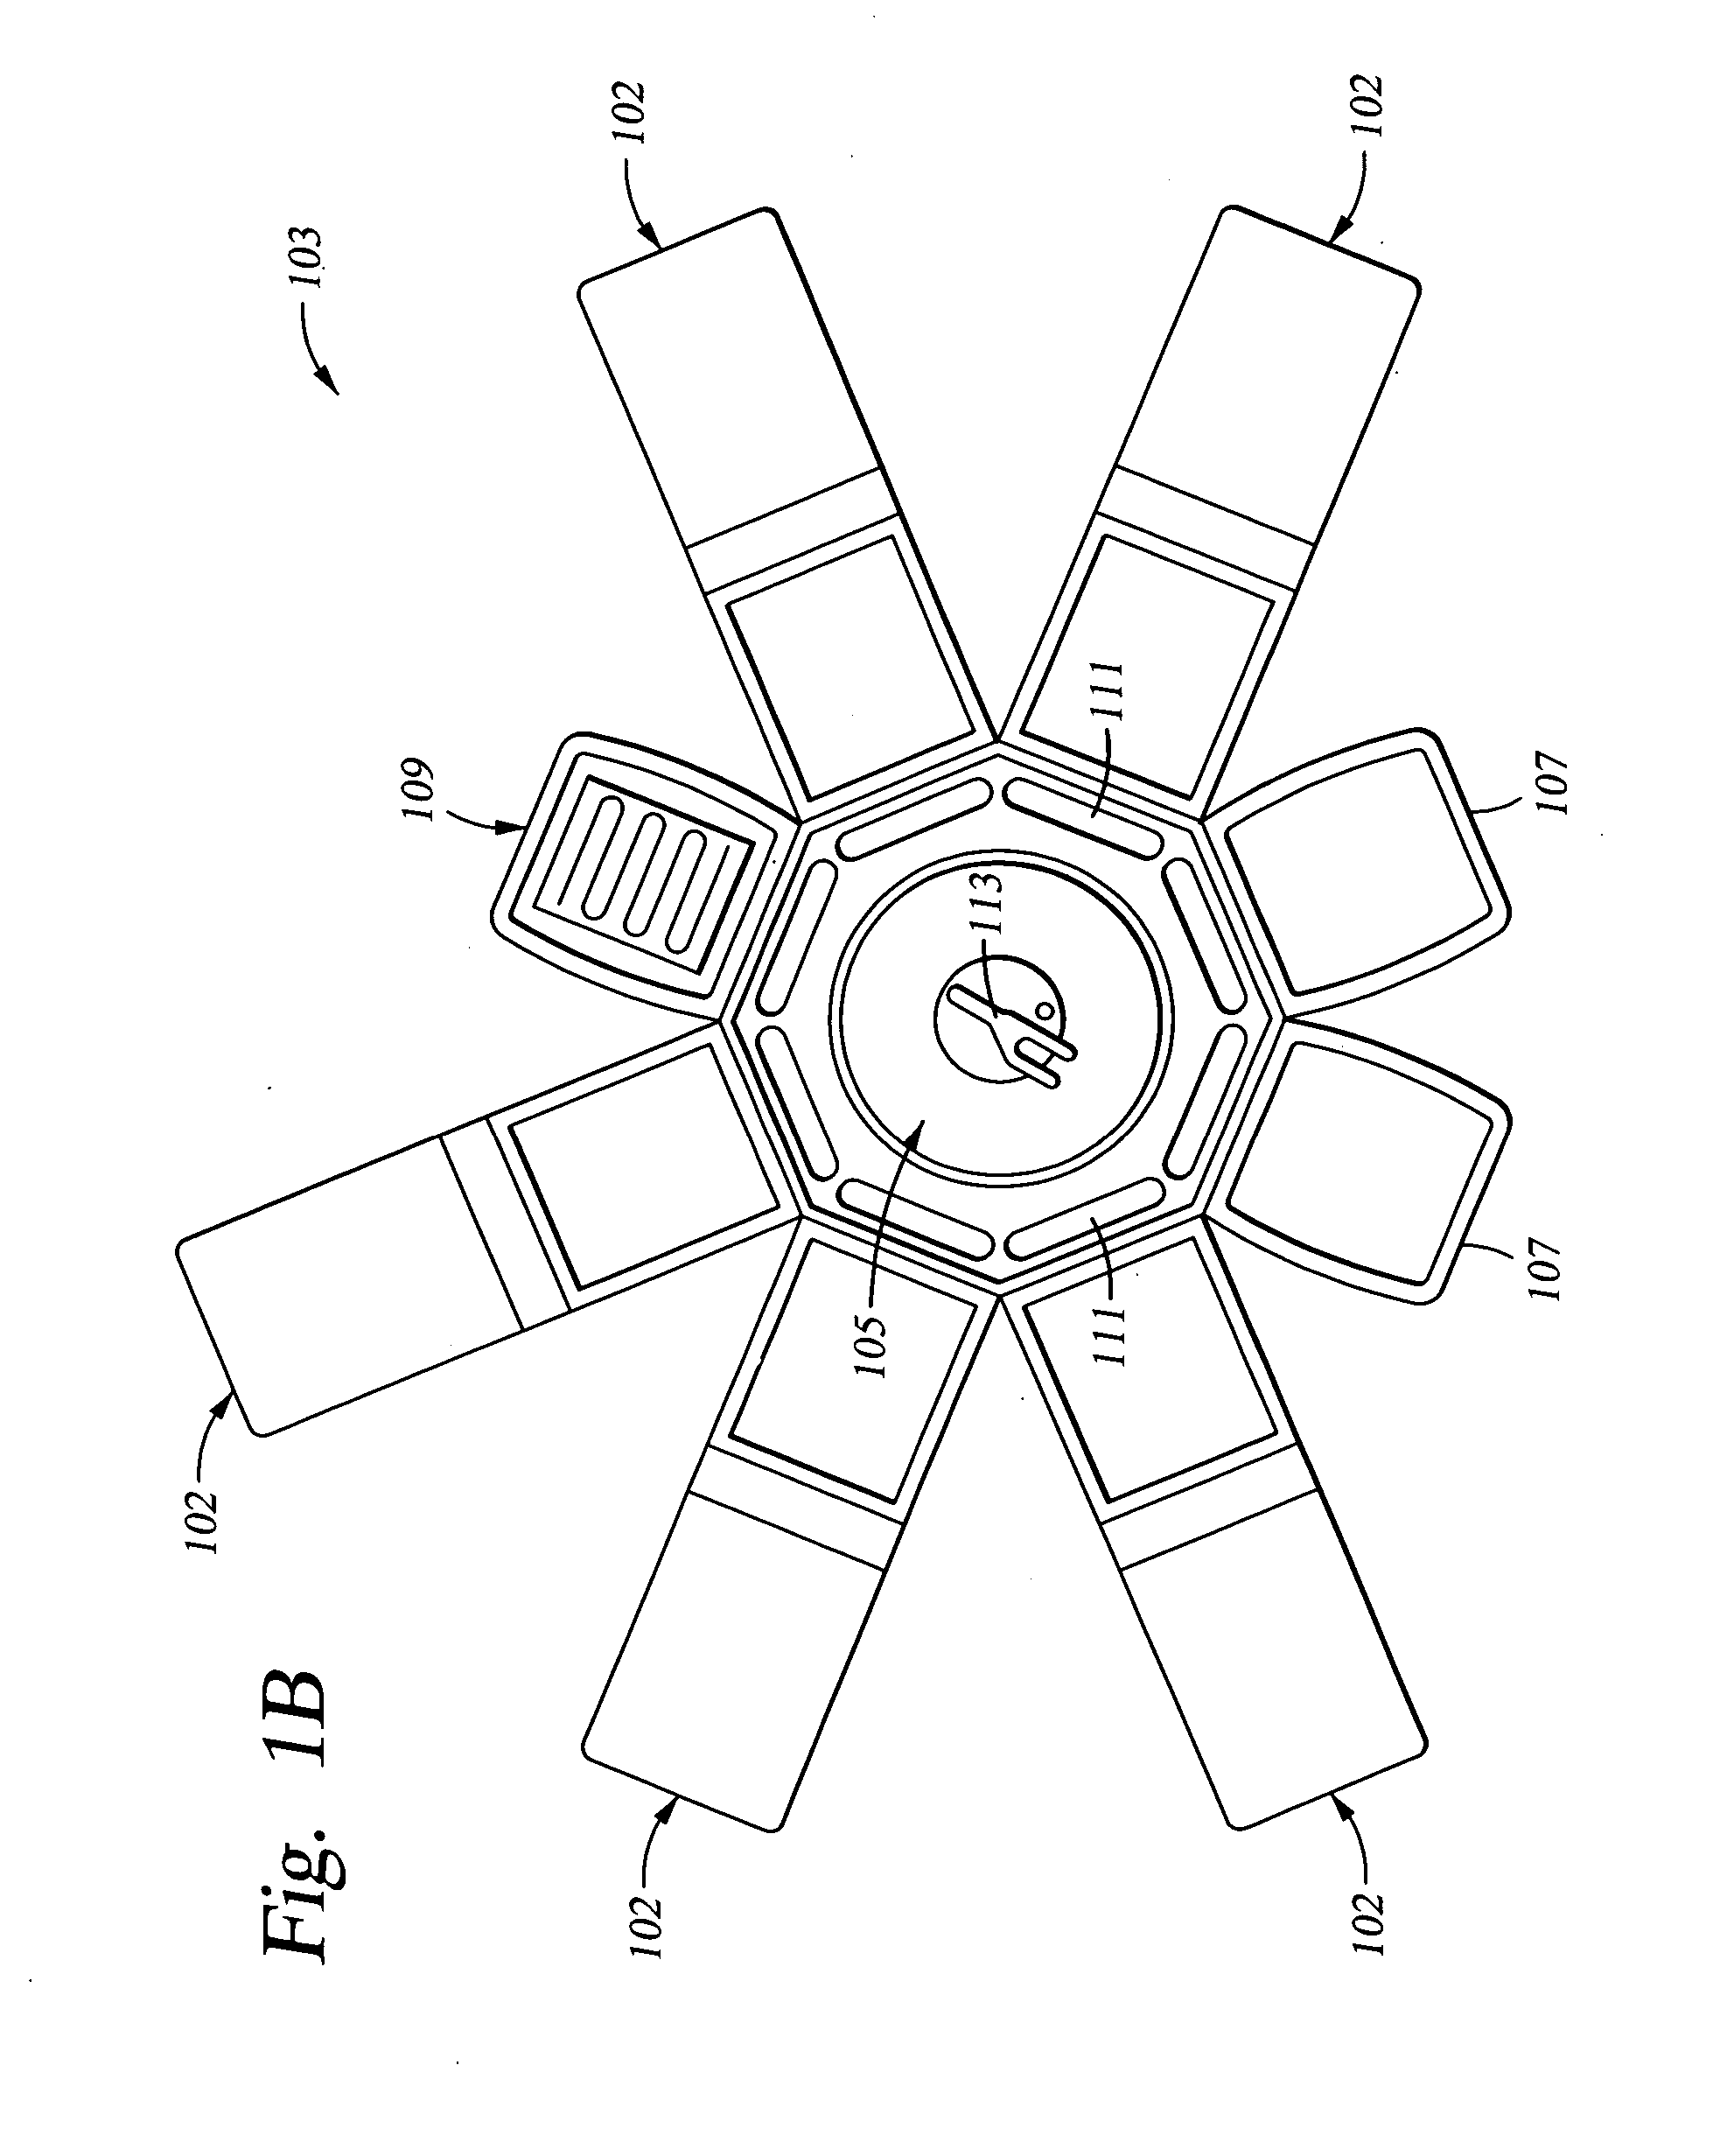 Buick Lesabre Wiring Diagram Free